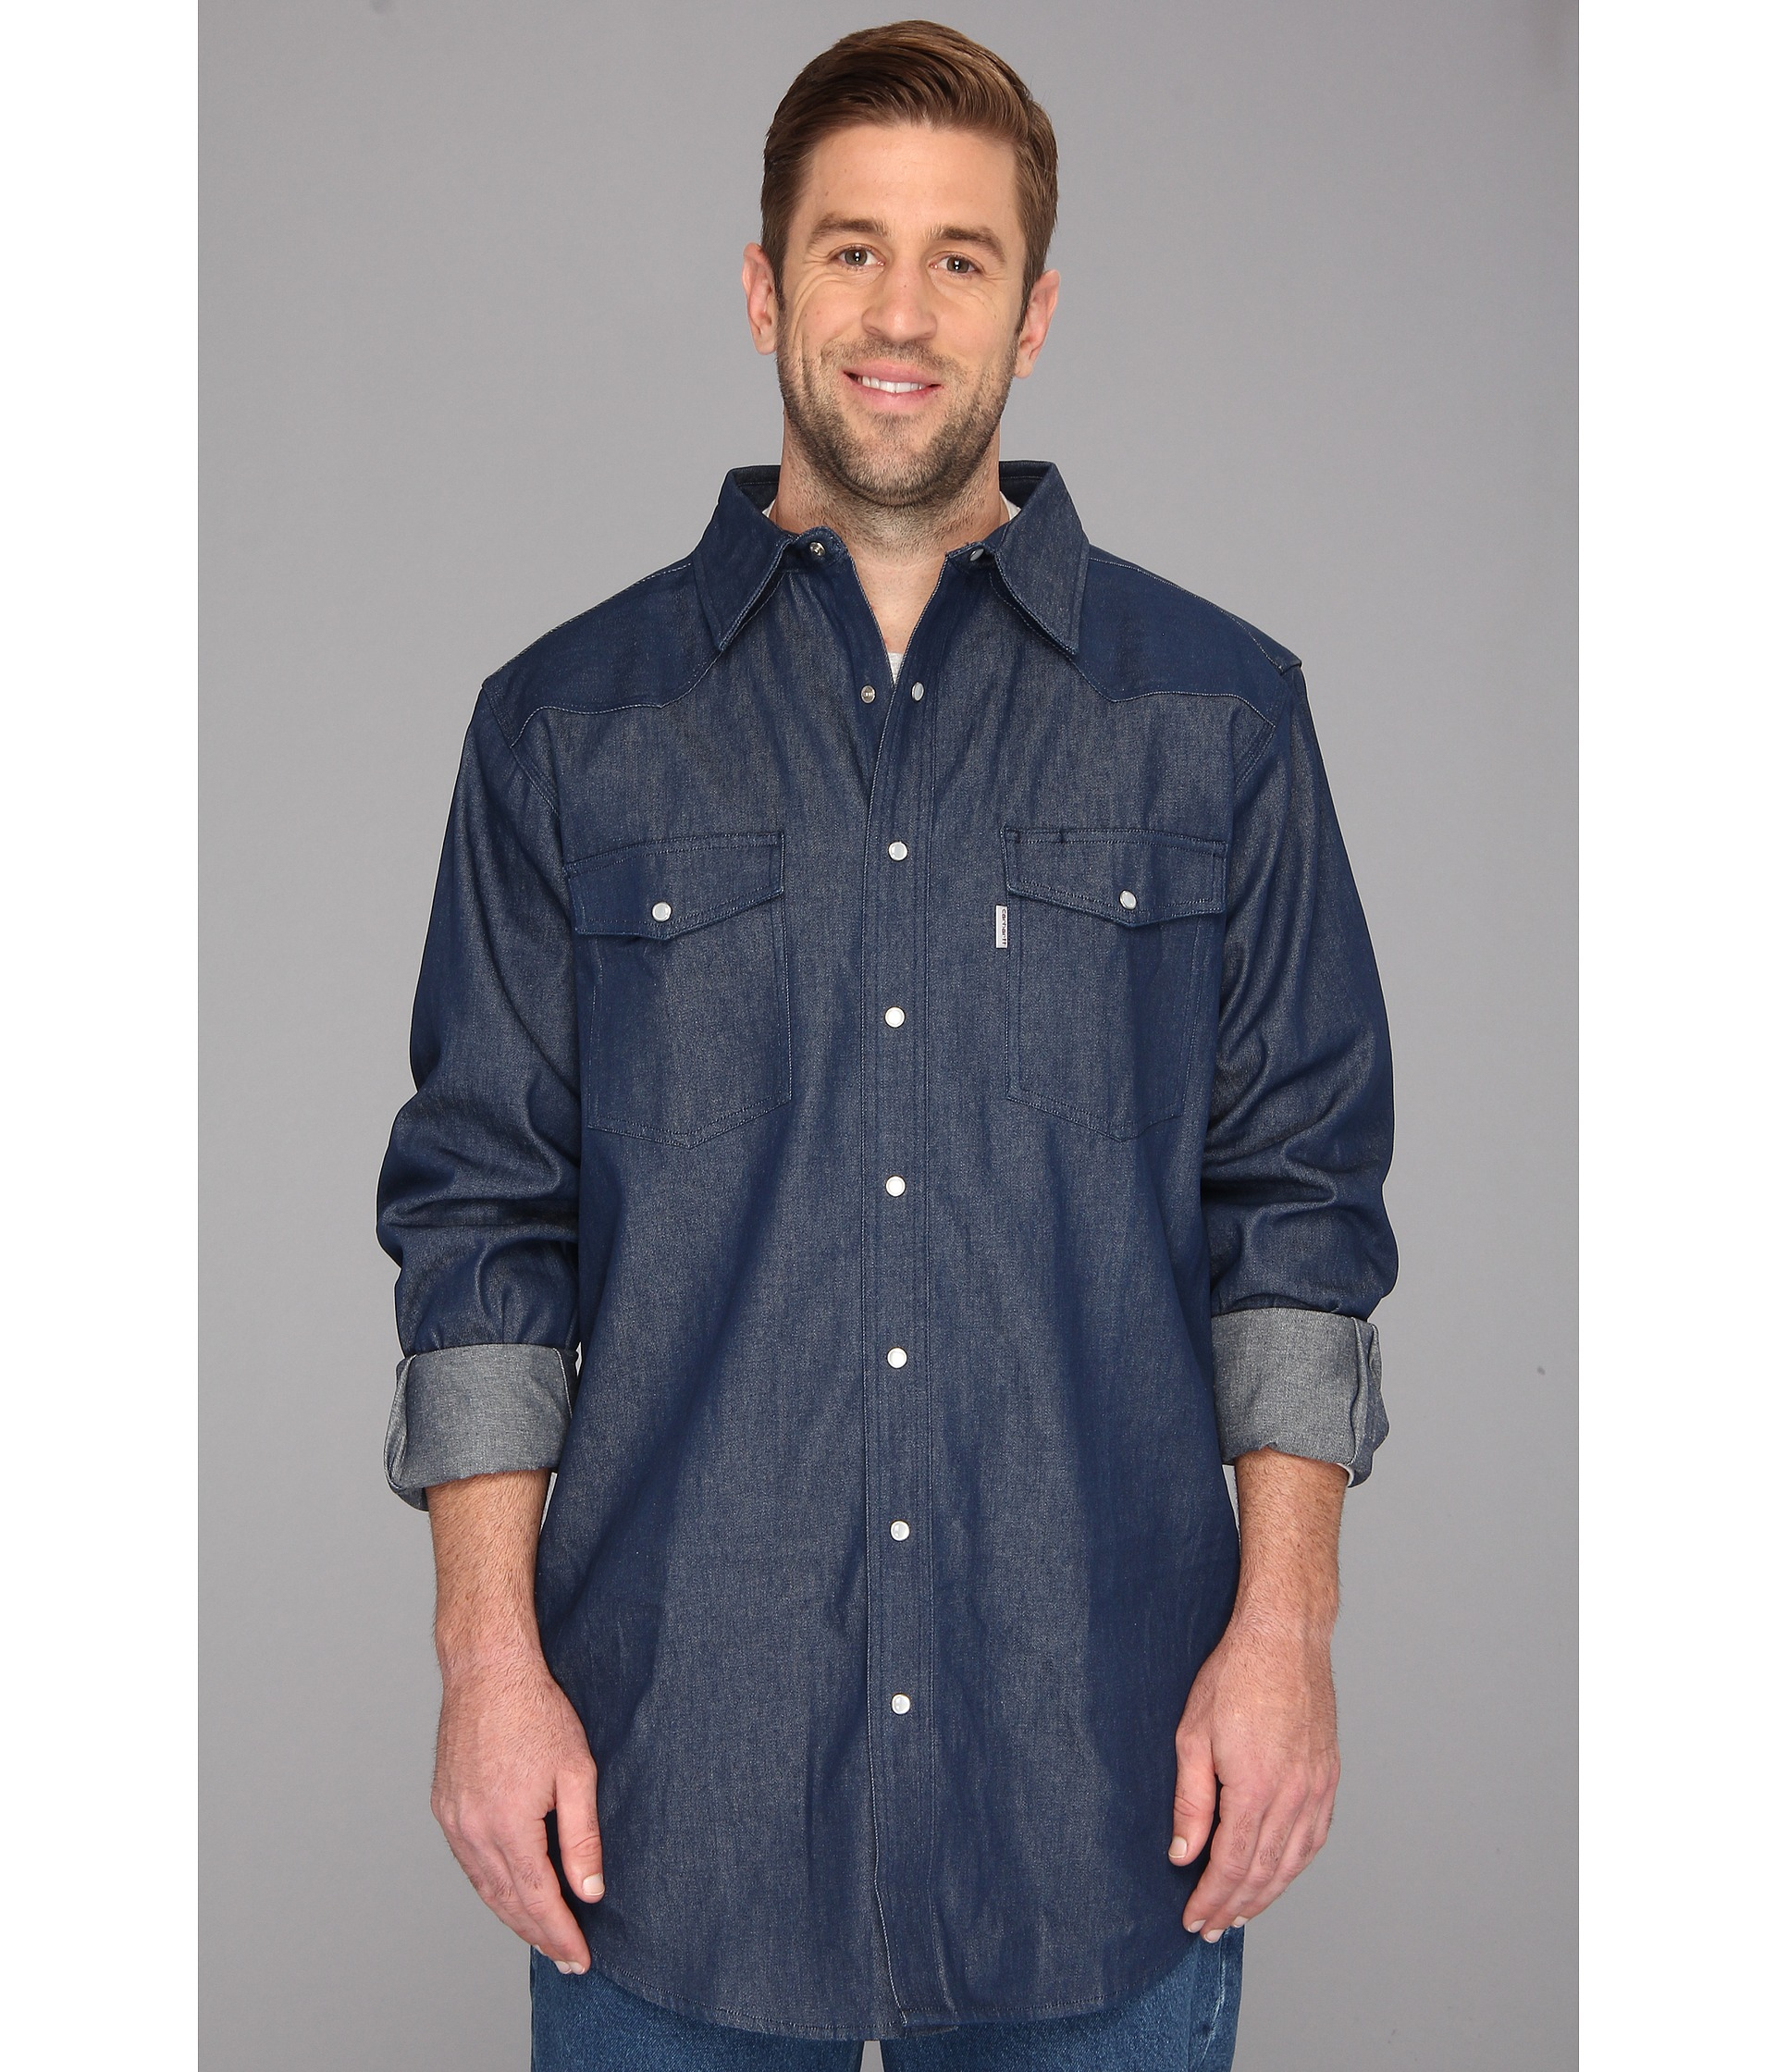 Carhartt ironwood denim work shirt tall in blue for men for Tall mens work shirts